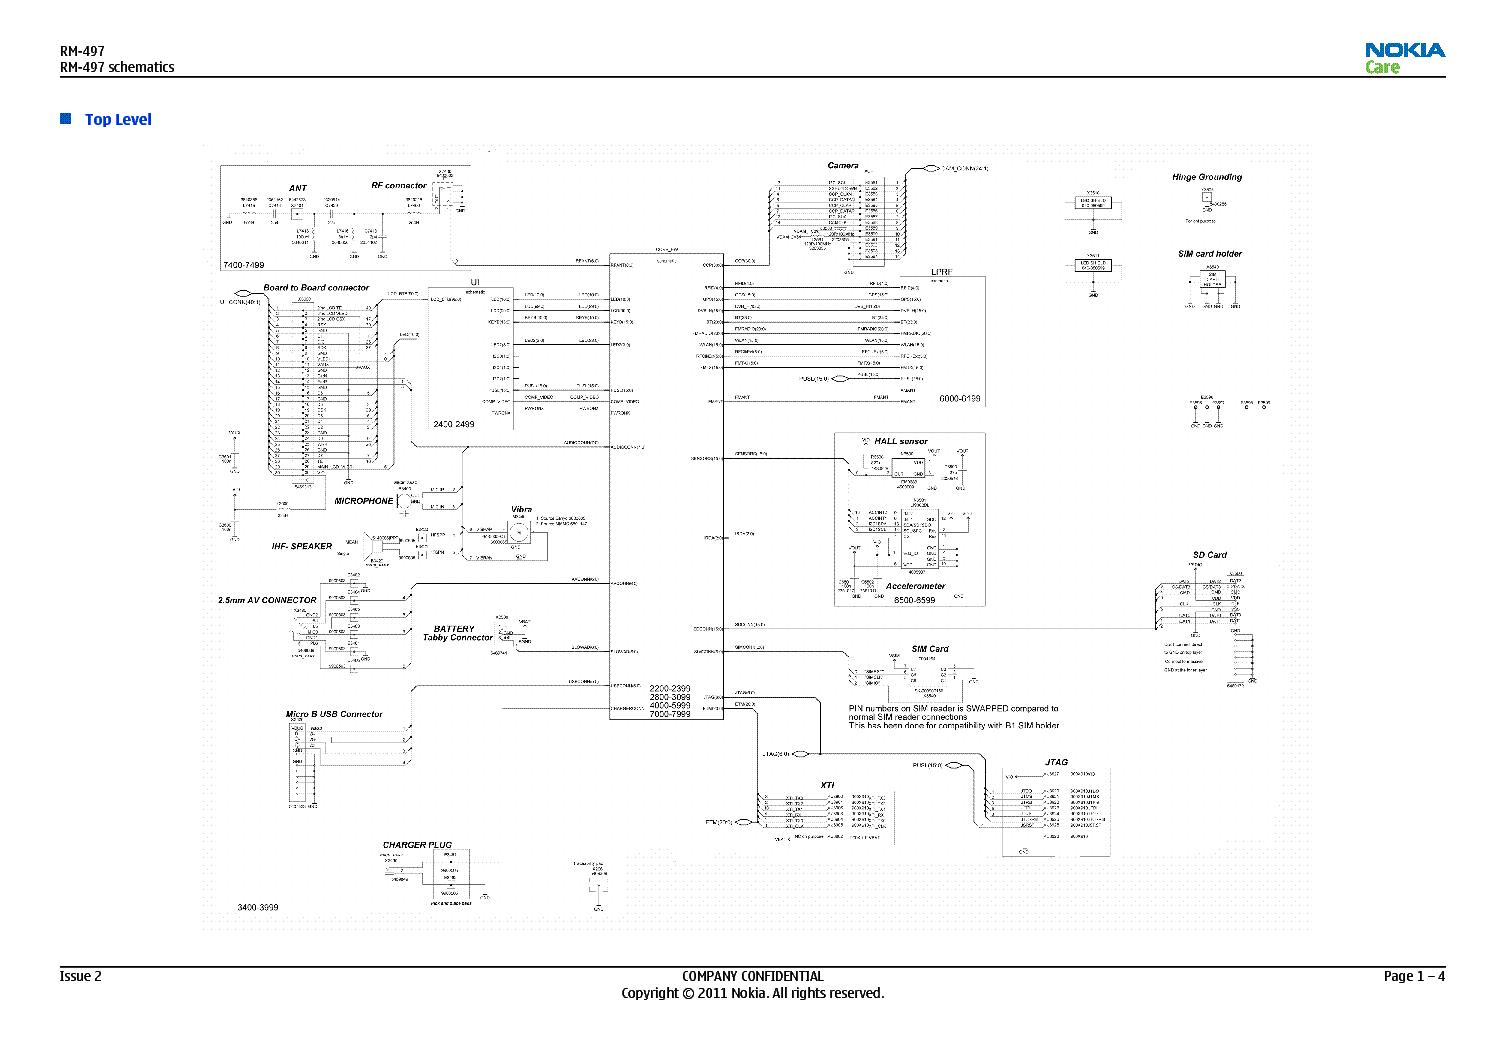 Nokia - Schematics & Service Manuals PDF